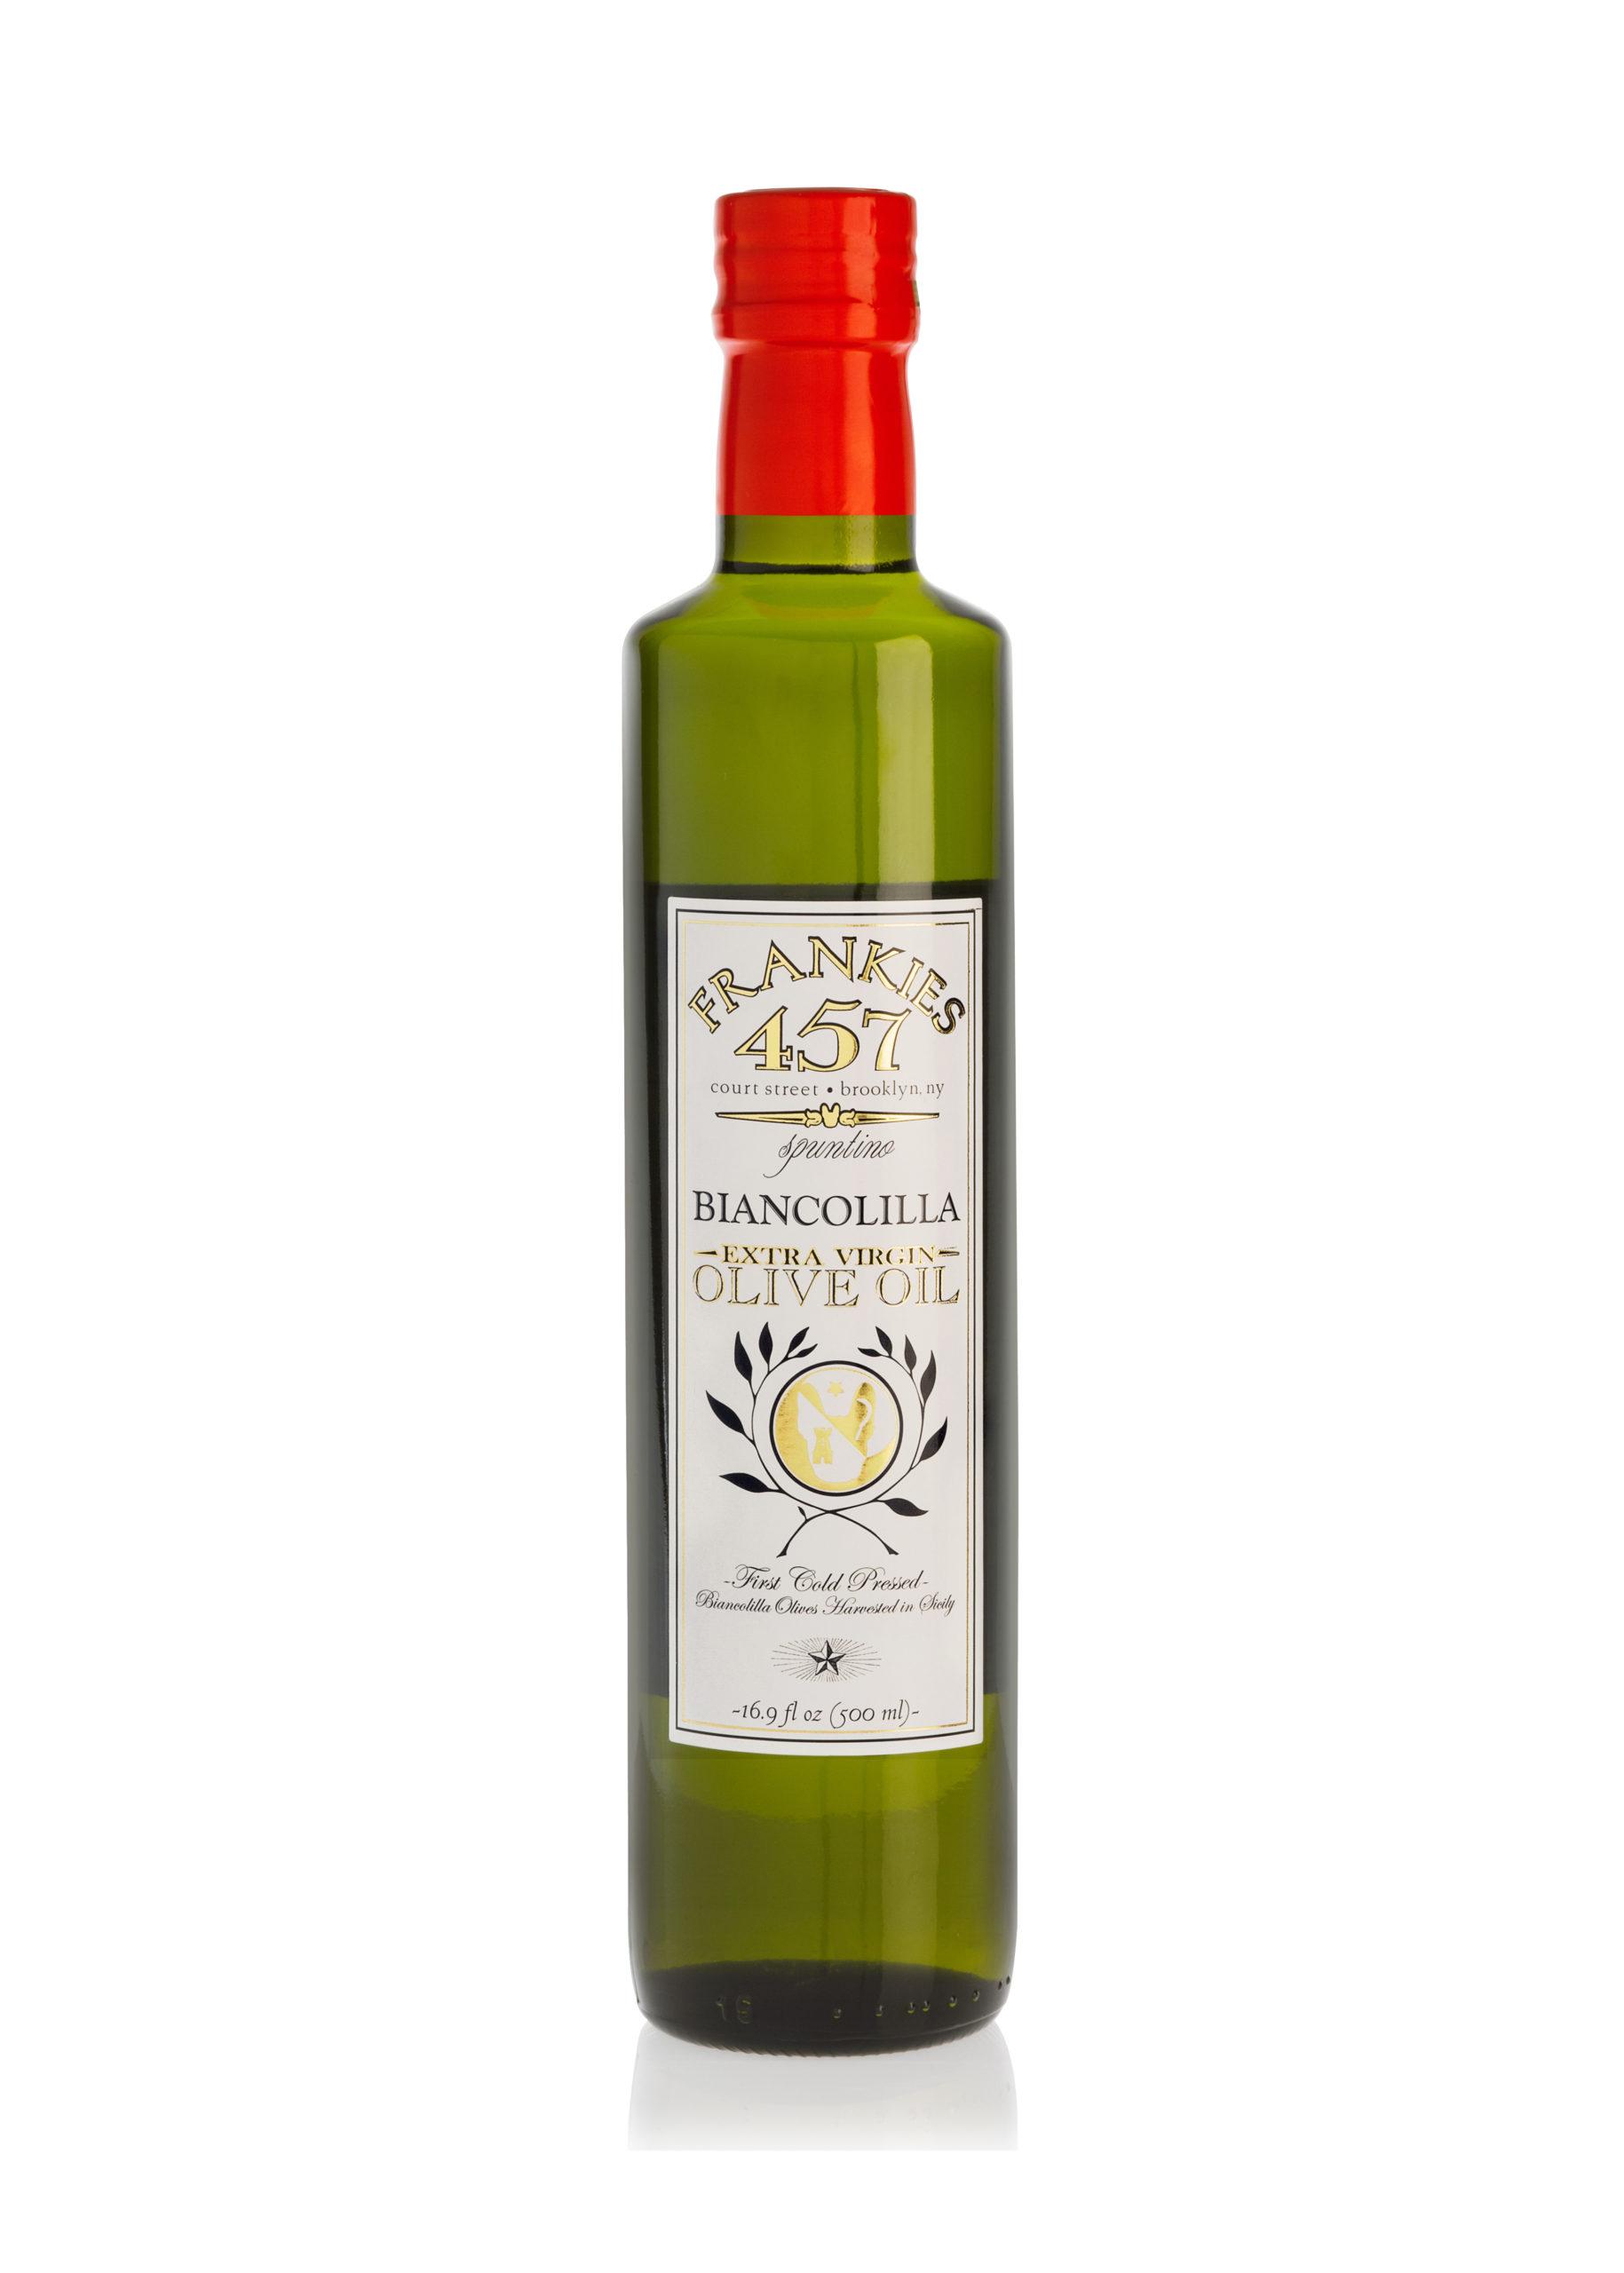 Frankies 457 Spuntino Biancolilla Extra Virgin Olive Oil